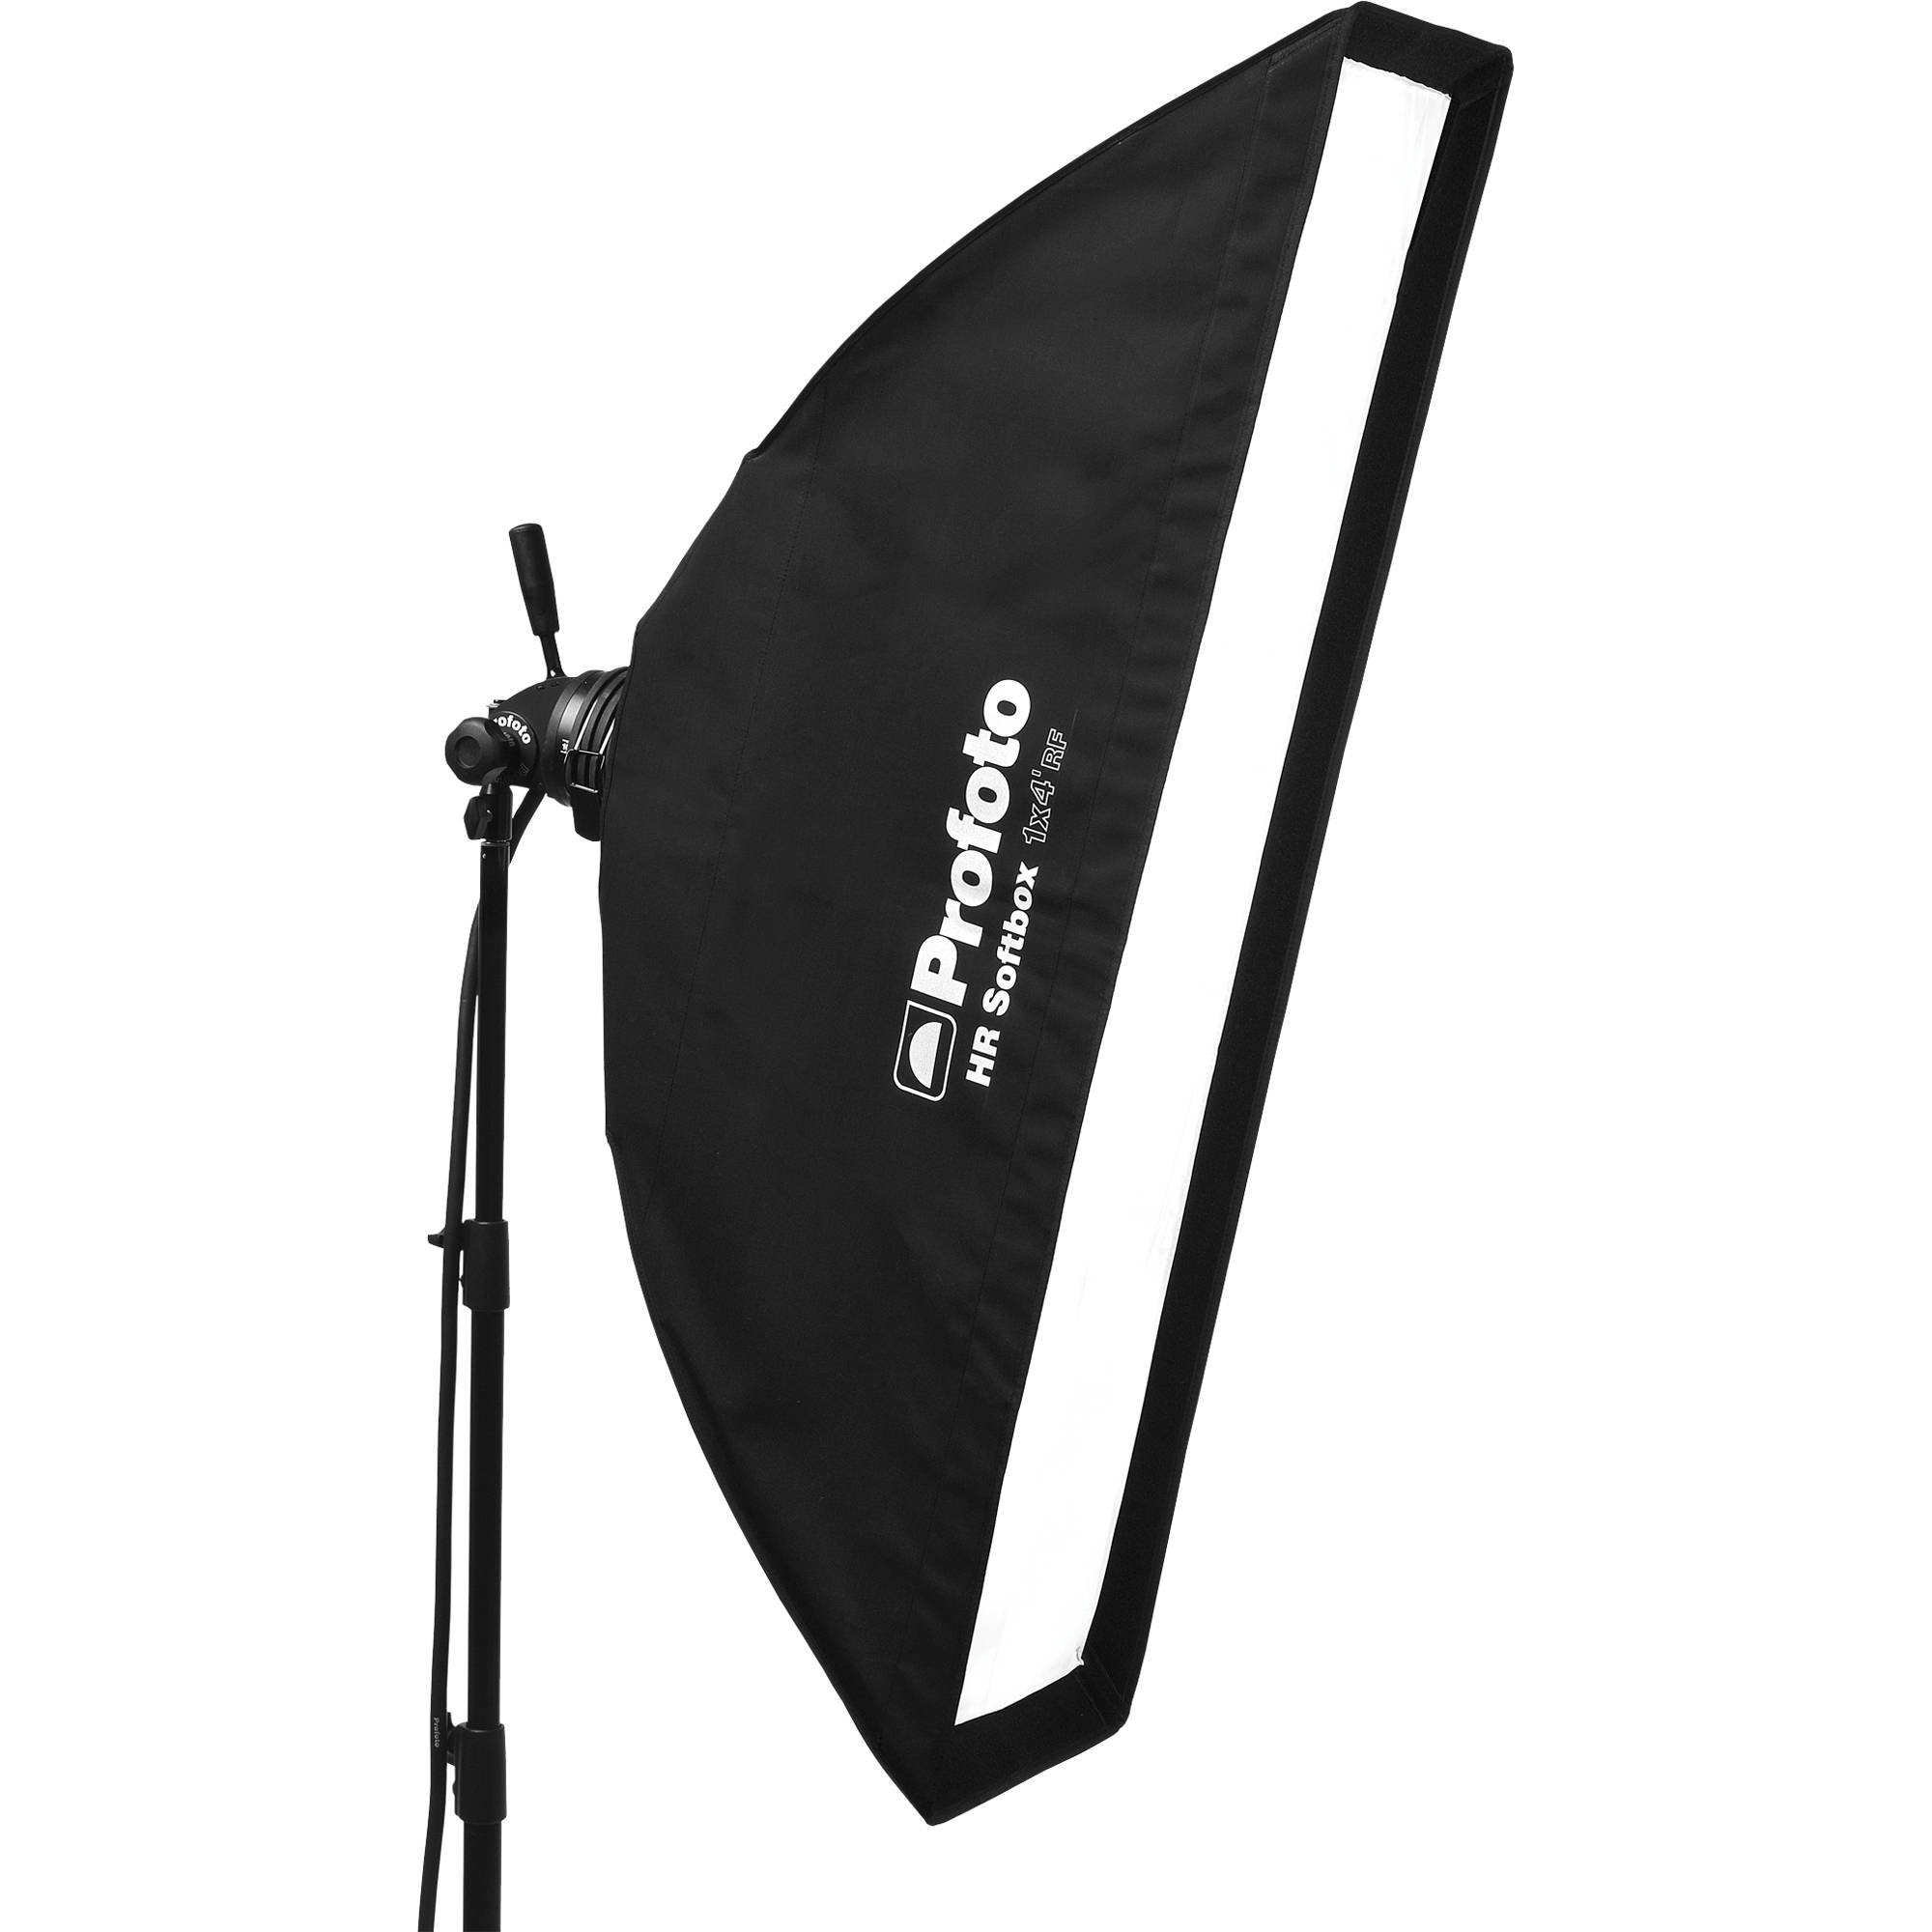 Profoto 1 x 4' HR Softbox 100496 B&H Photo Video